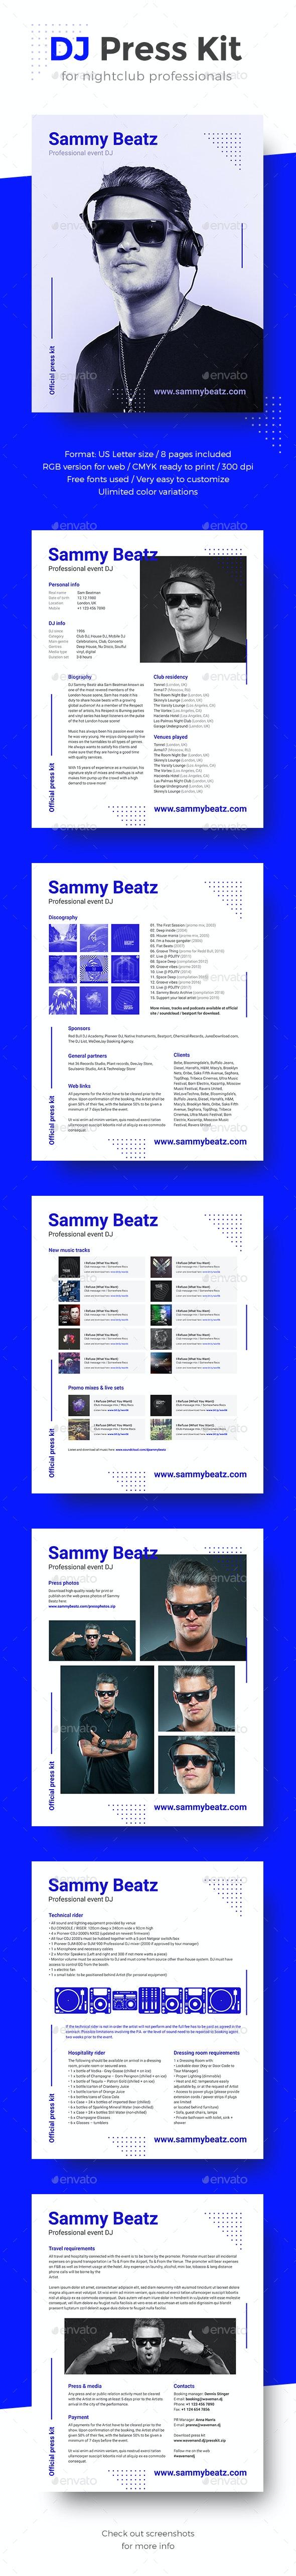 Promo DJ Press Kit / Rider / Resume PSD Template - Resumes Stationery